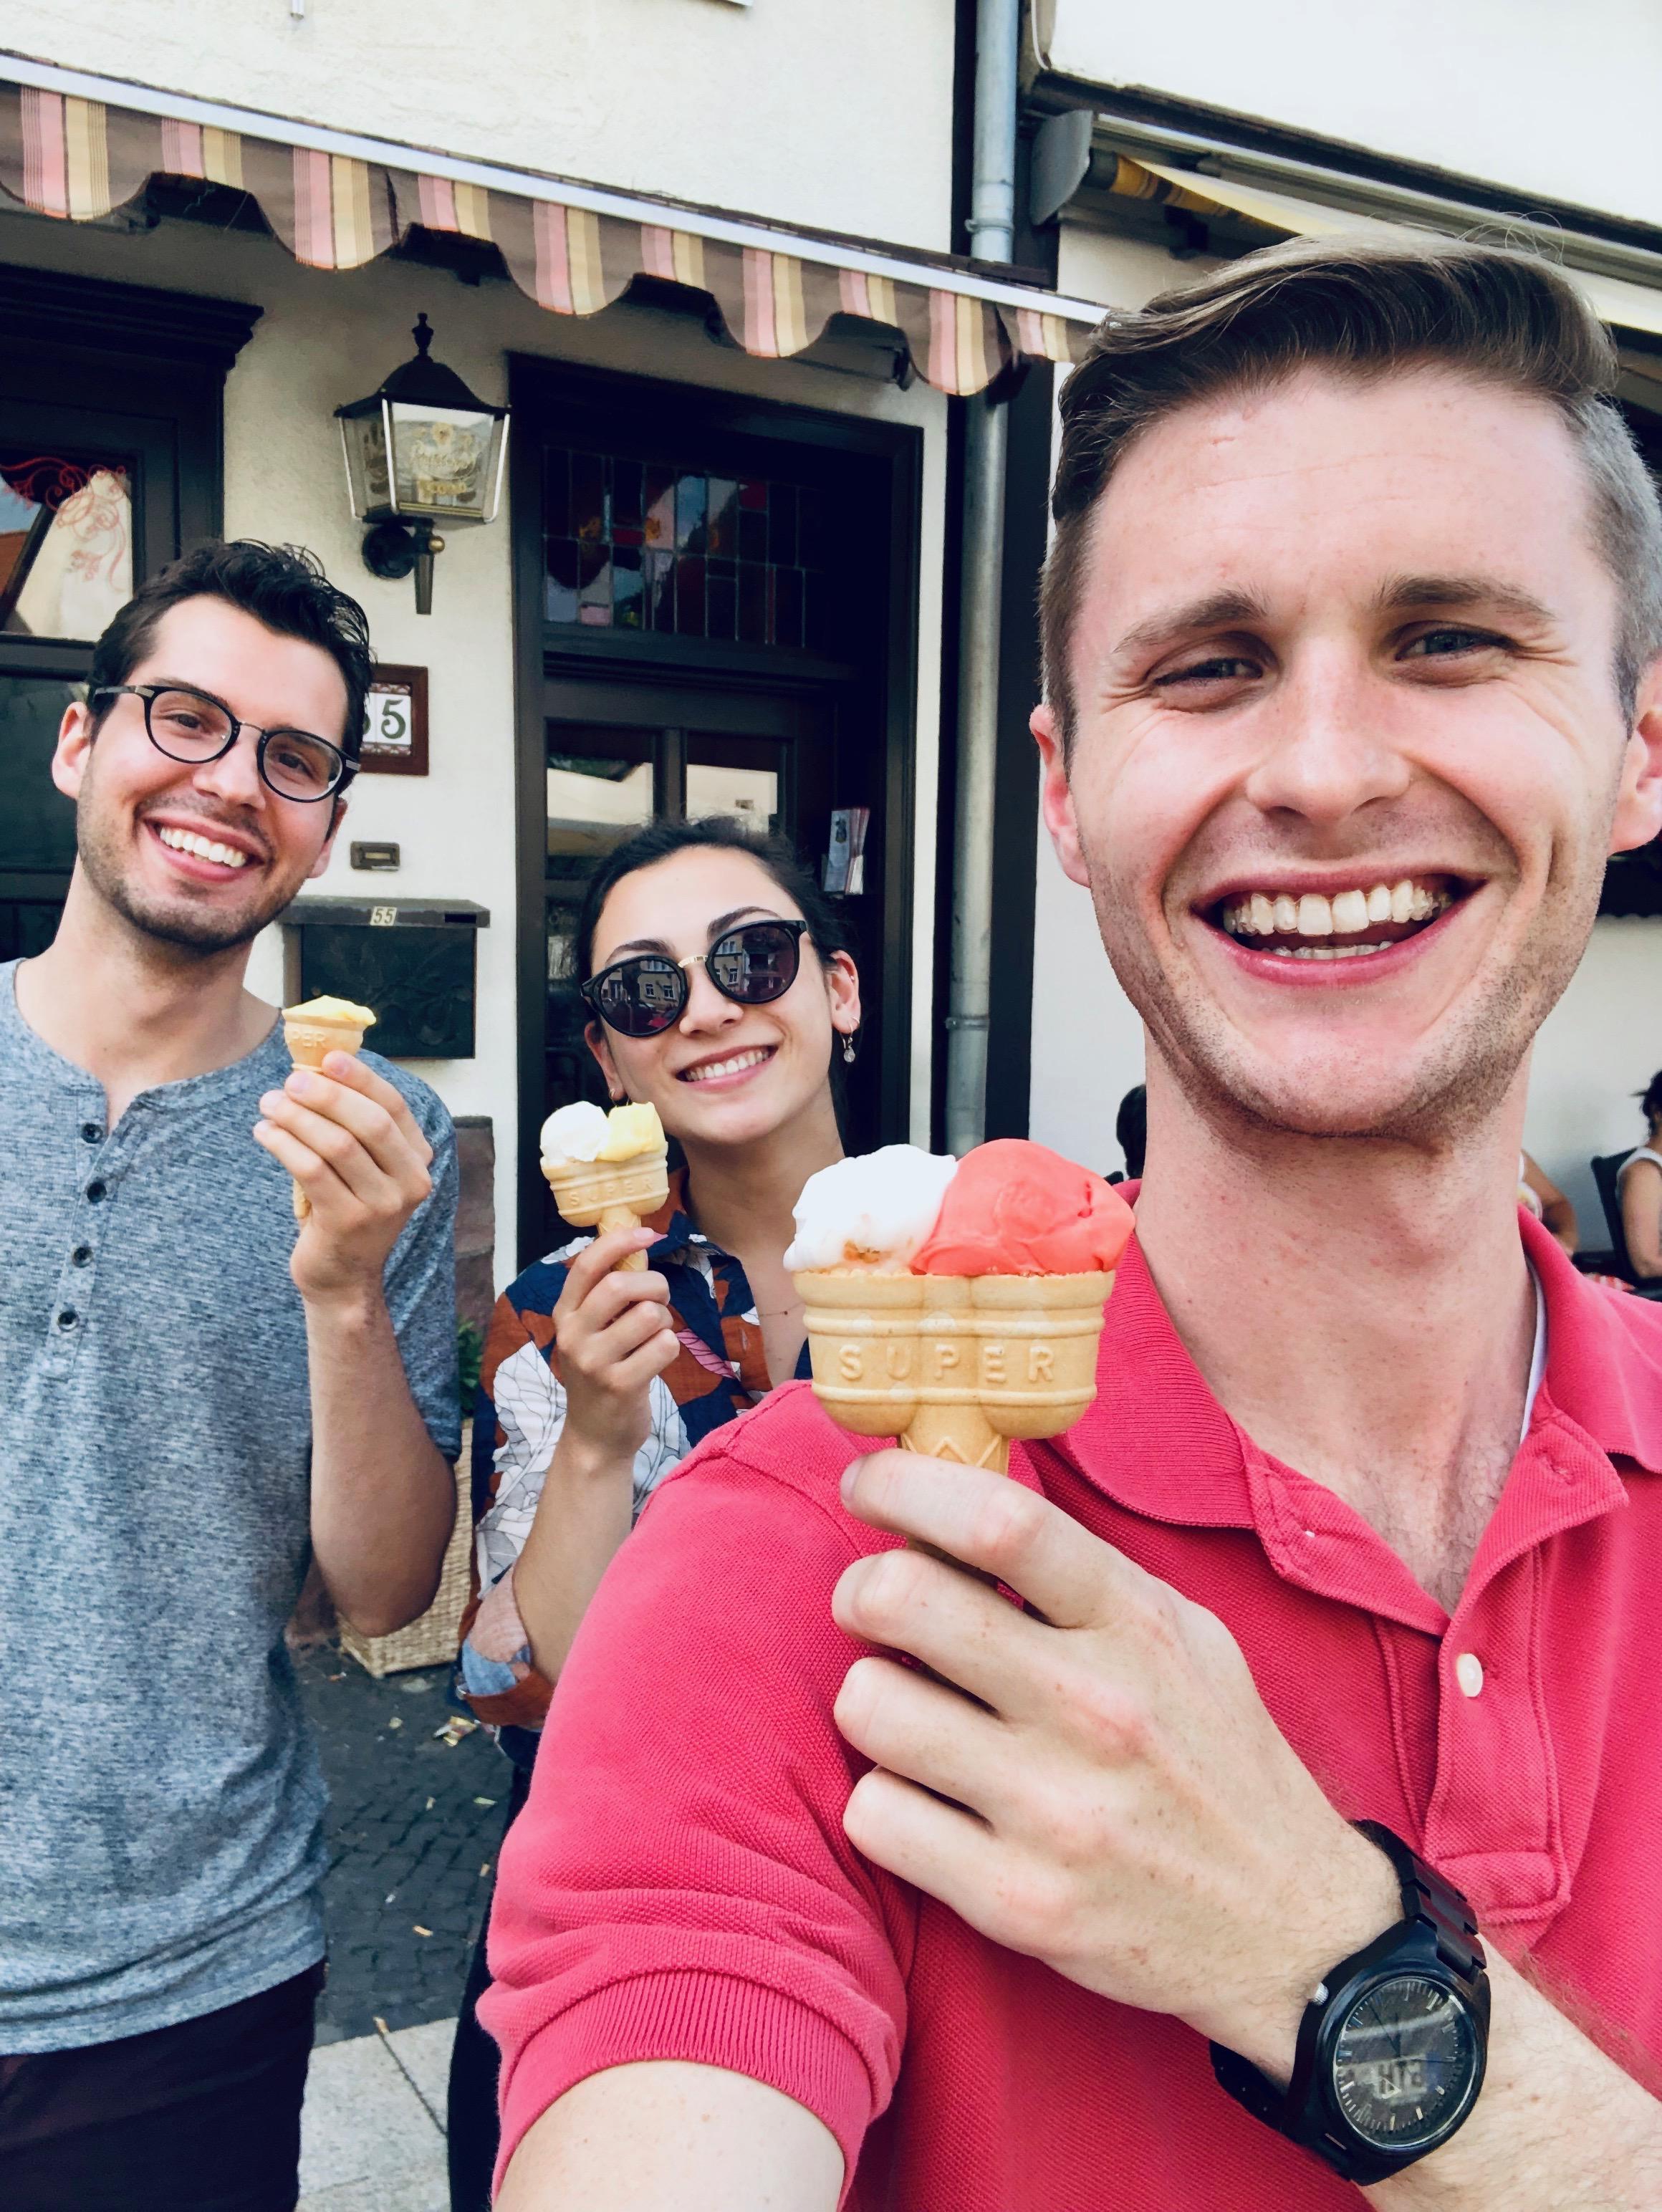 Enjoying some ice cream between visits.